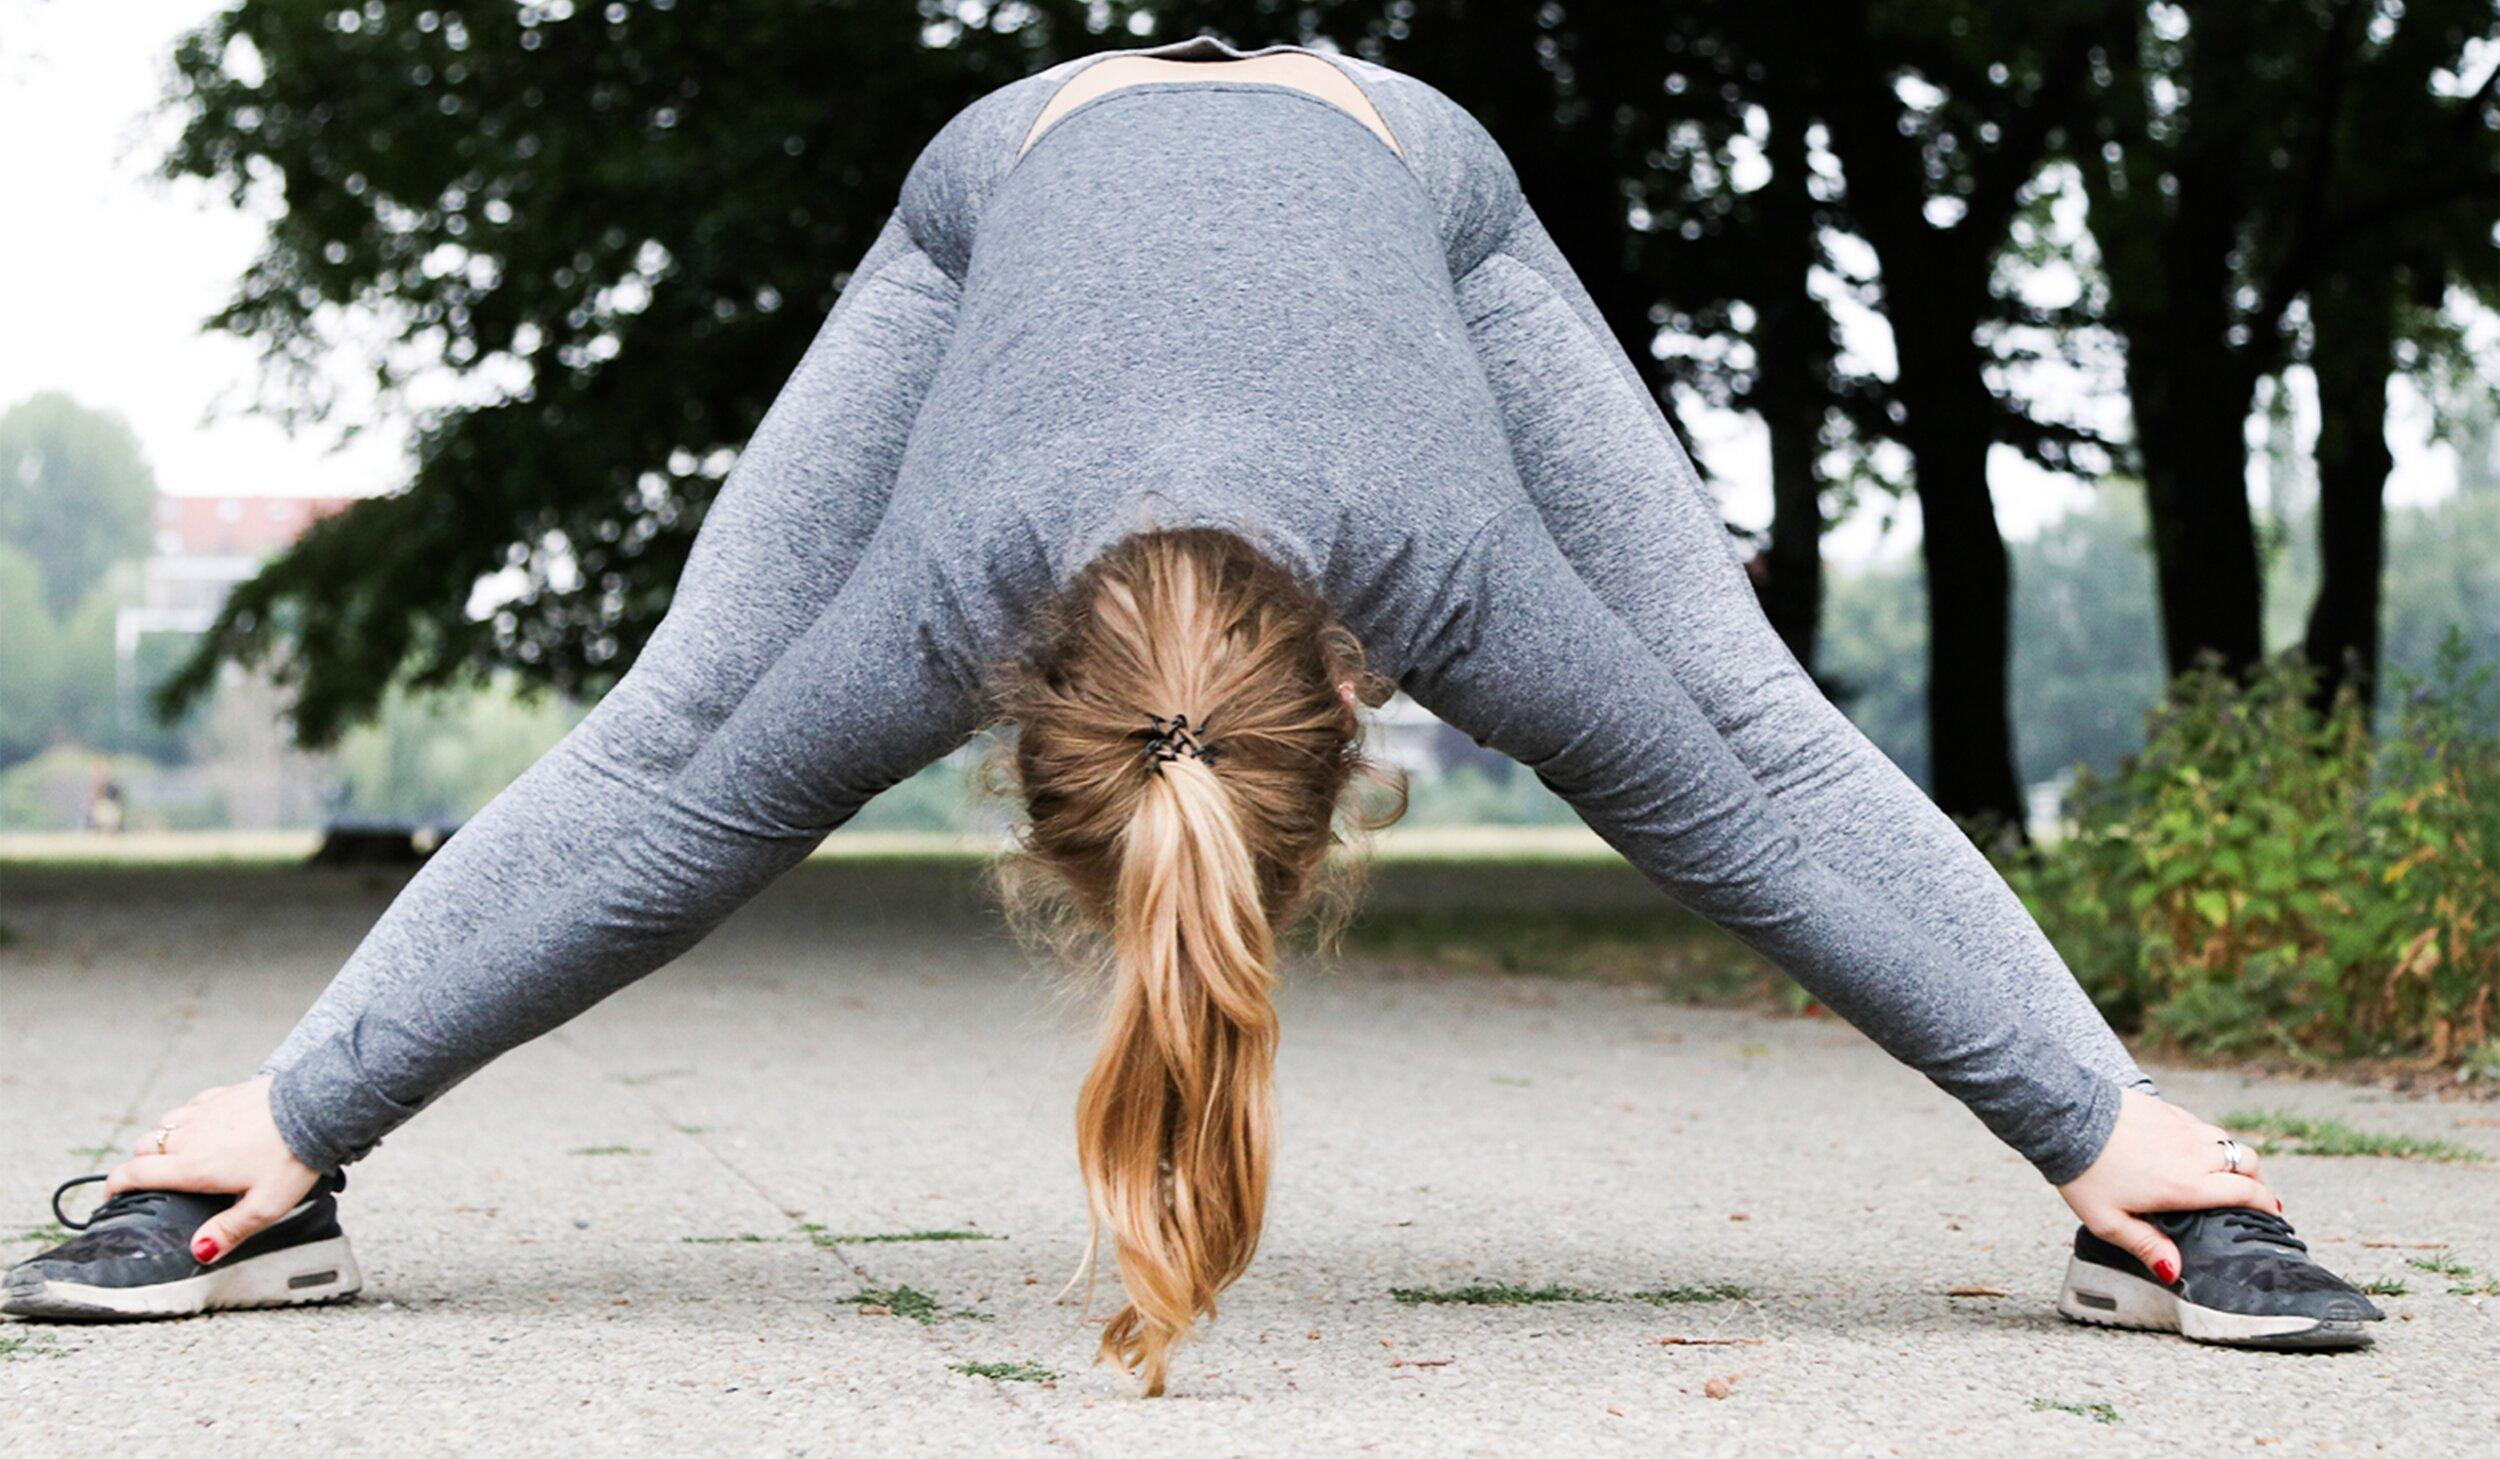 preparing for yoga class